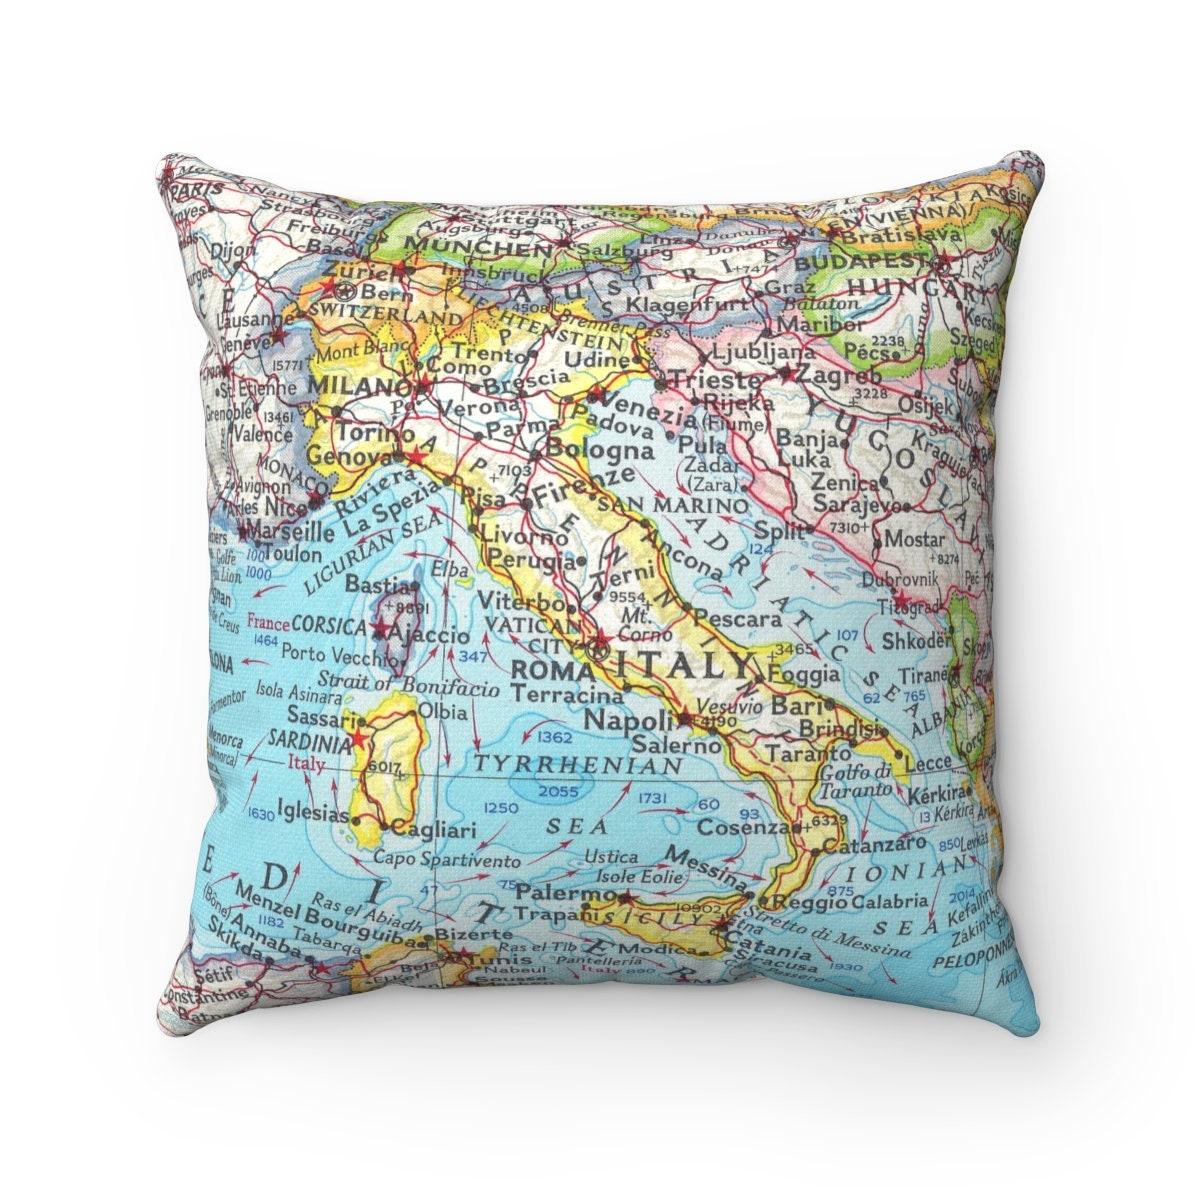 Italy Map Pillow Italy Wedding Gift Italy Pillow   Etsy